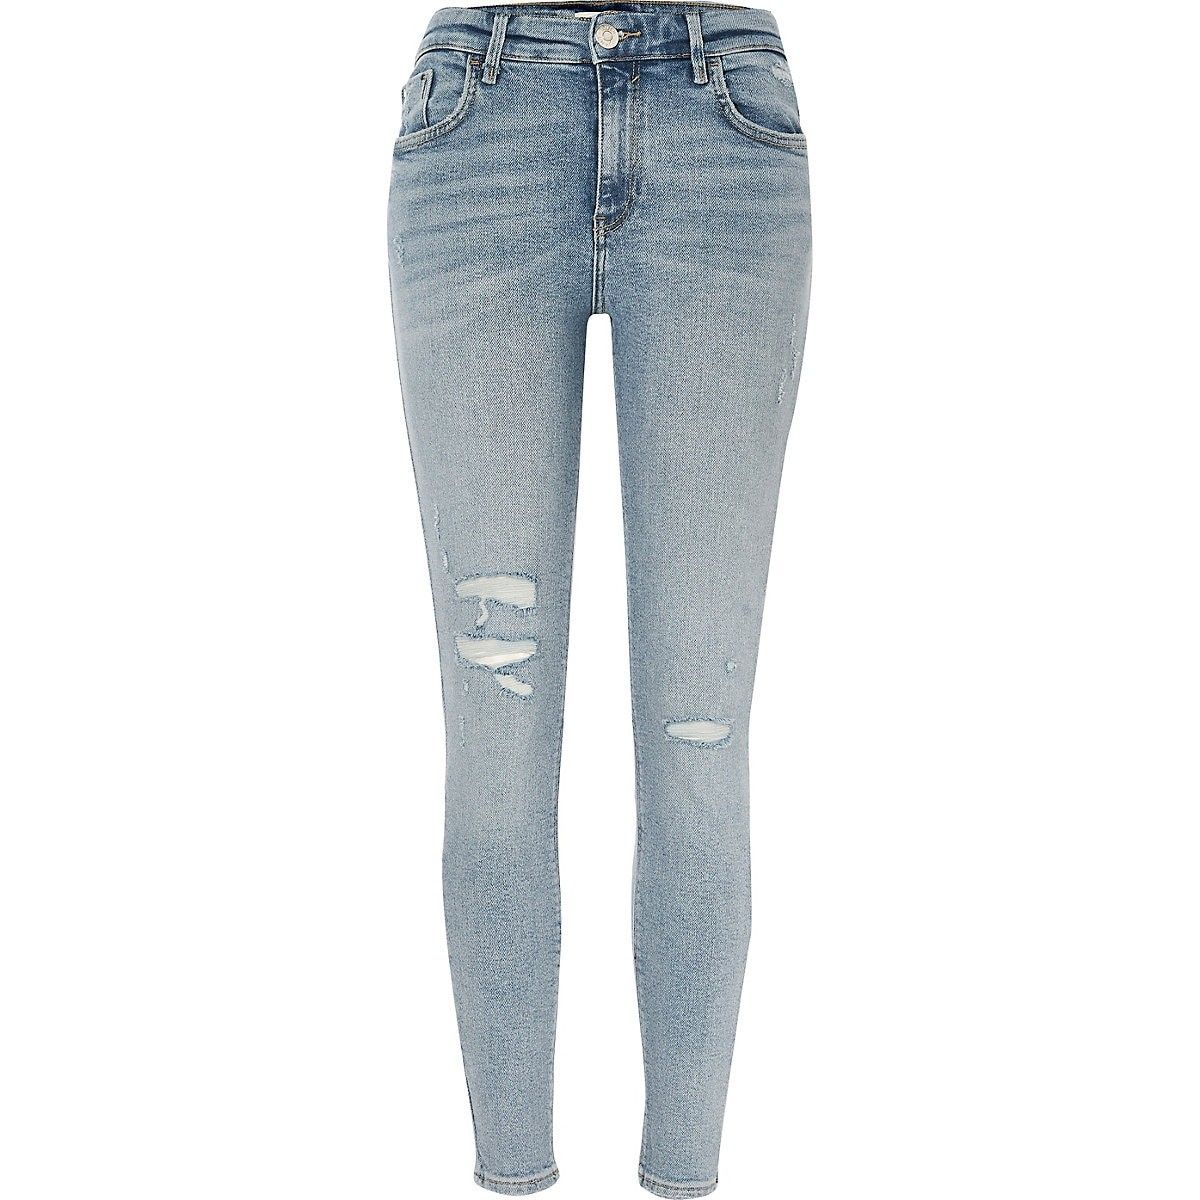 058409db7e1f85 Light blue Amelie super skinny jeans | pants in 2019 | Super skinny ...